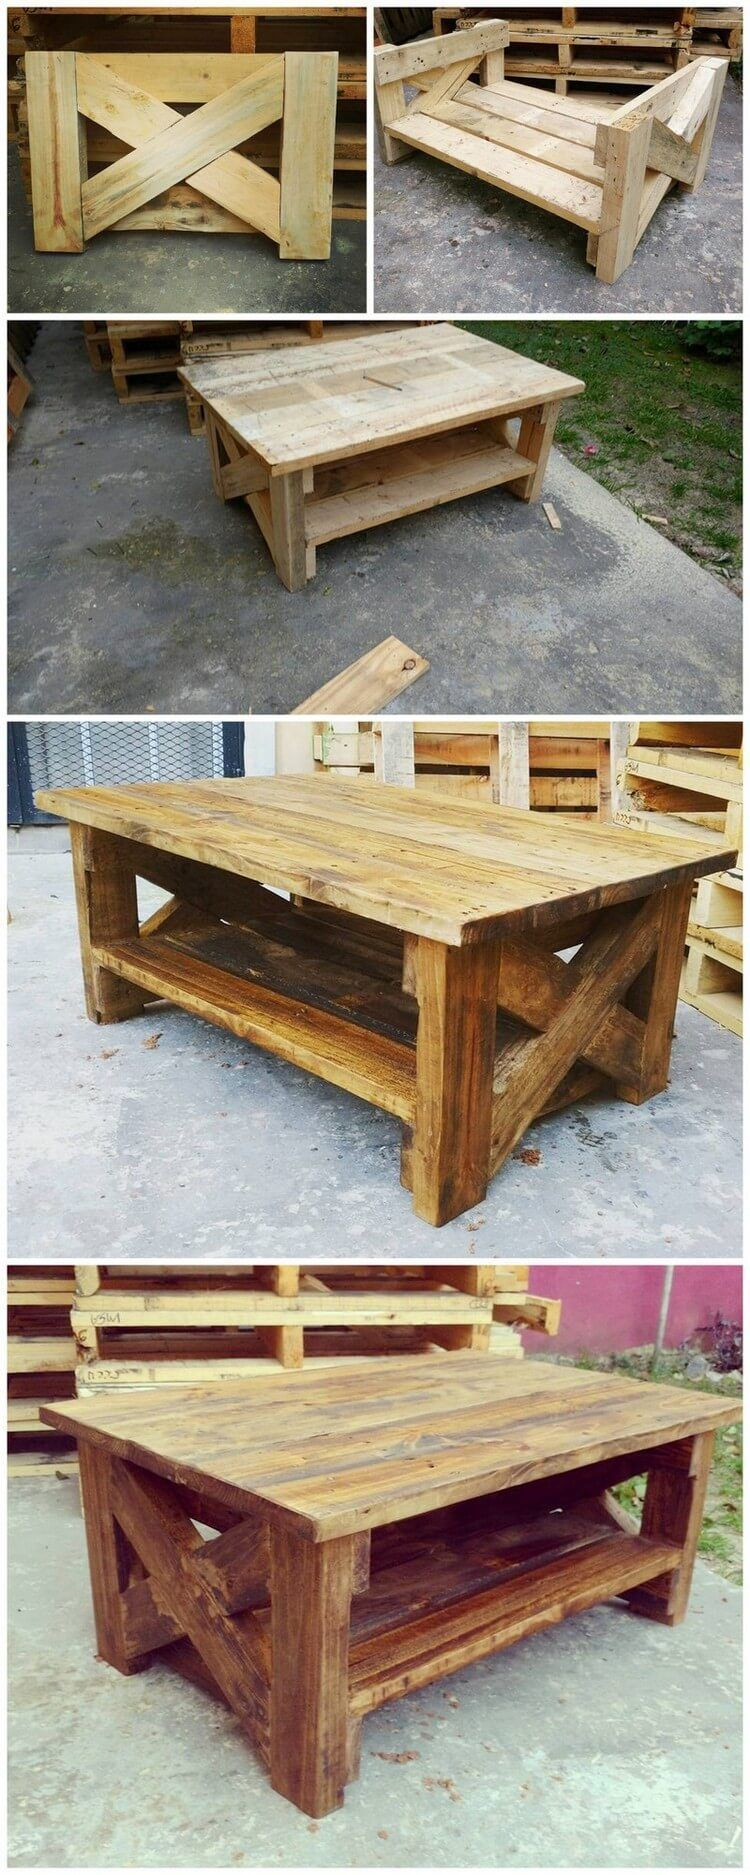 diy pallet table gage s houseee pallet pallet furniture rustic rh pinterest com